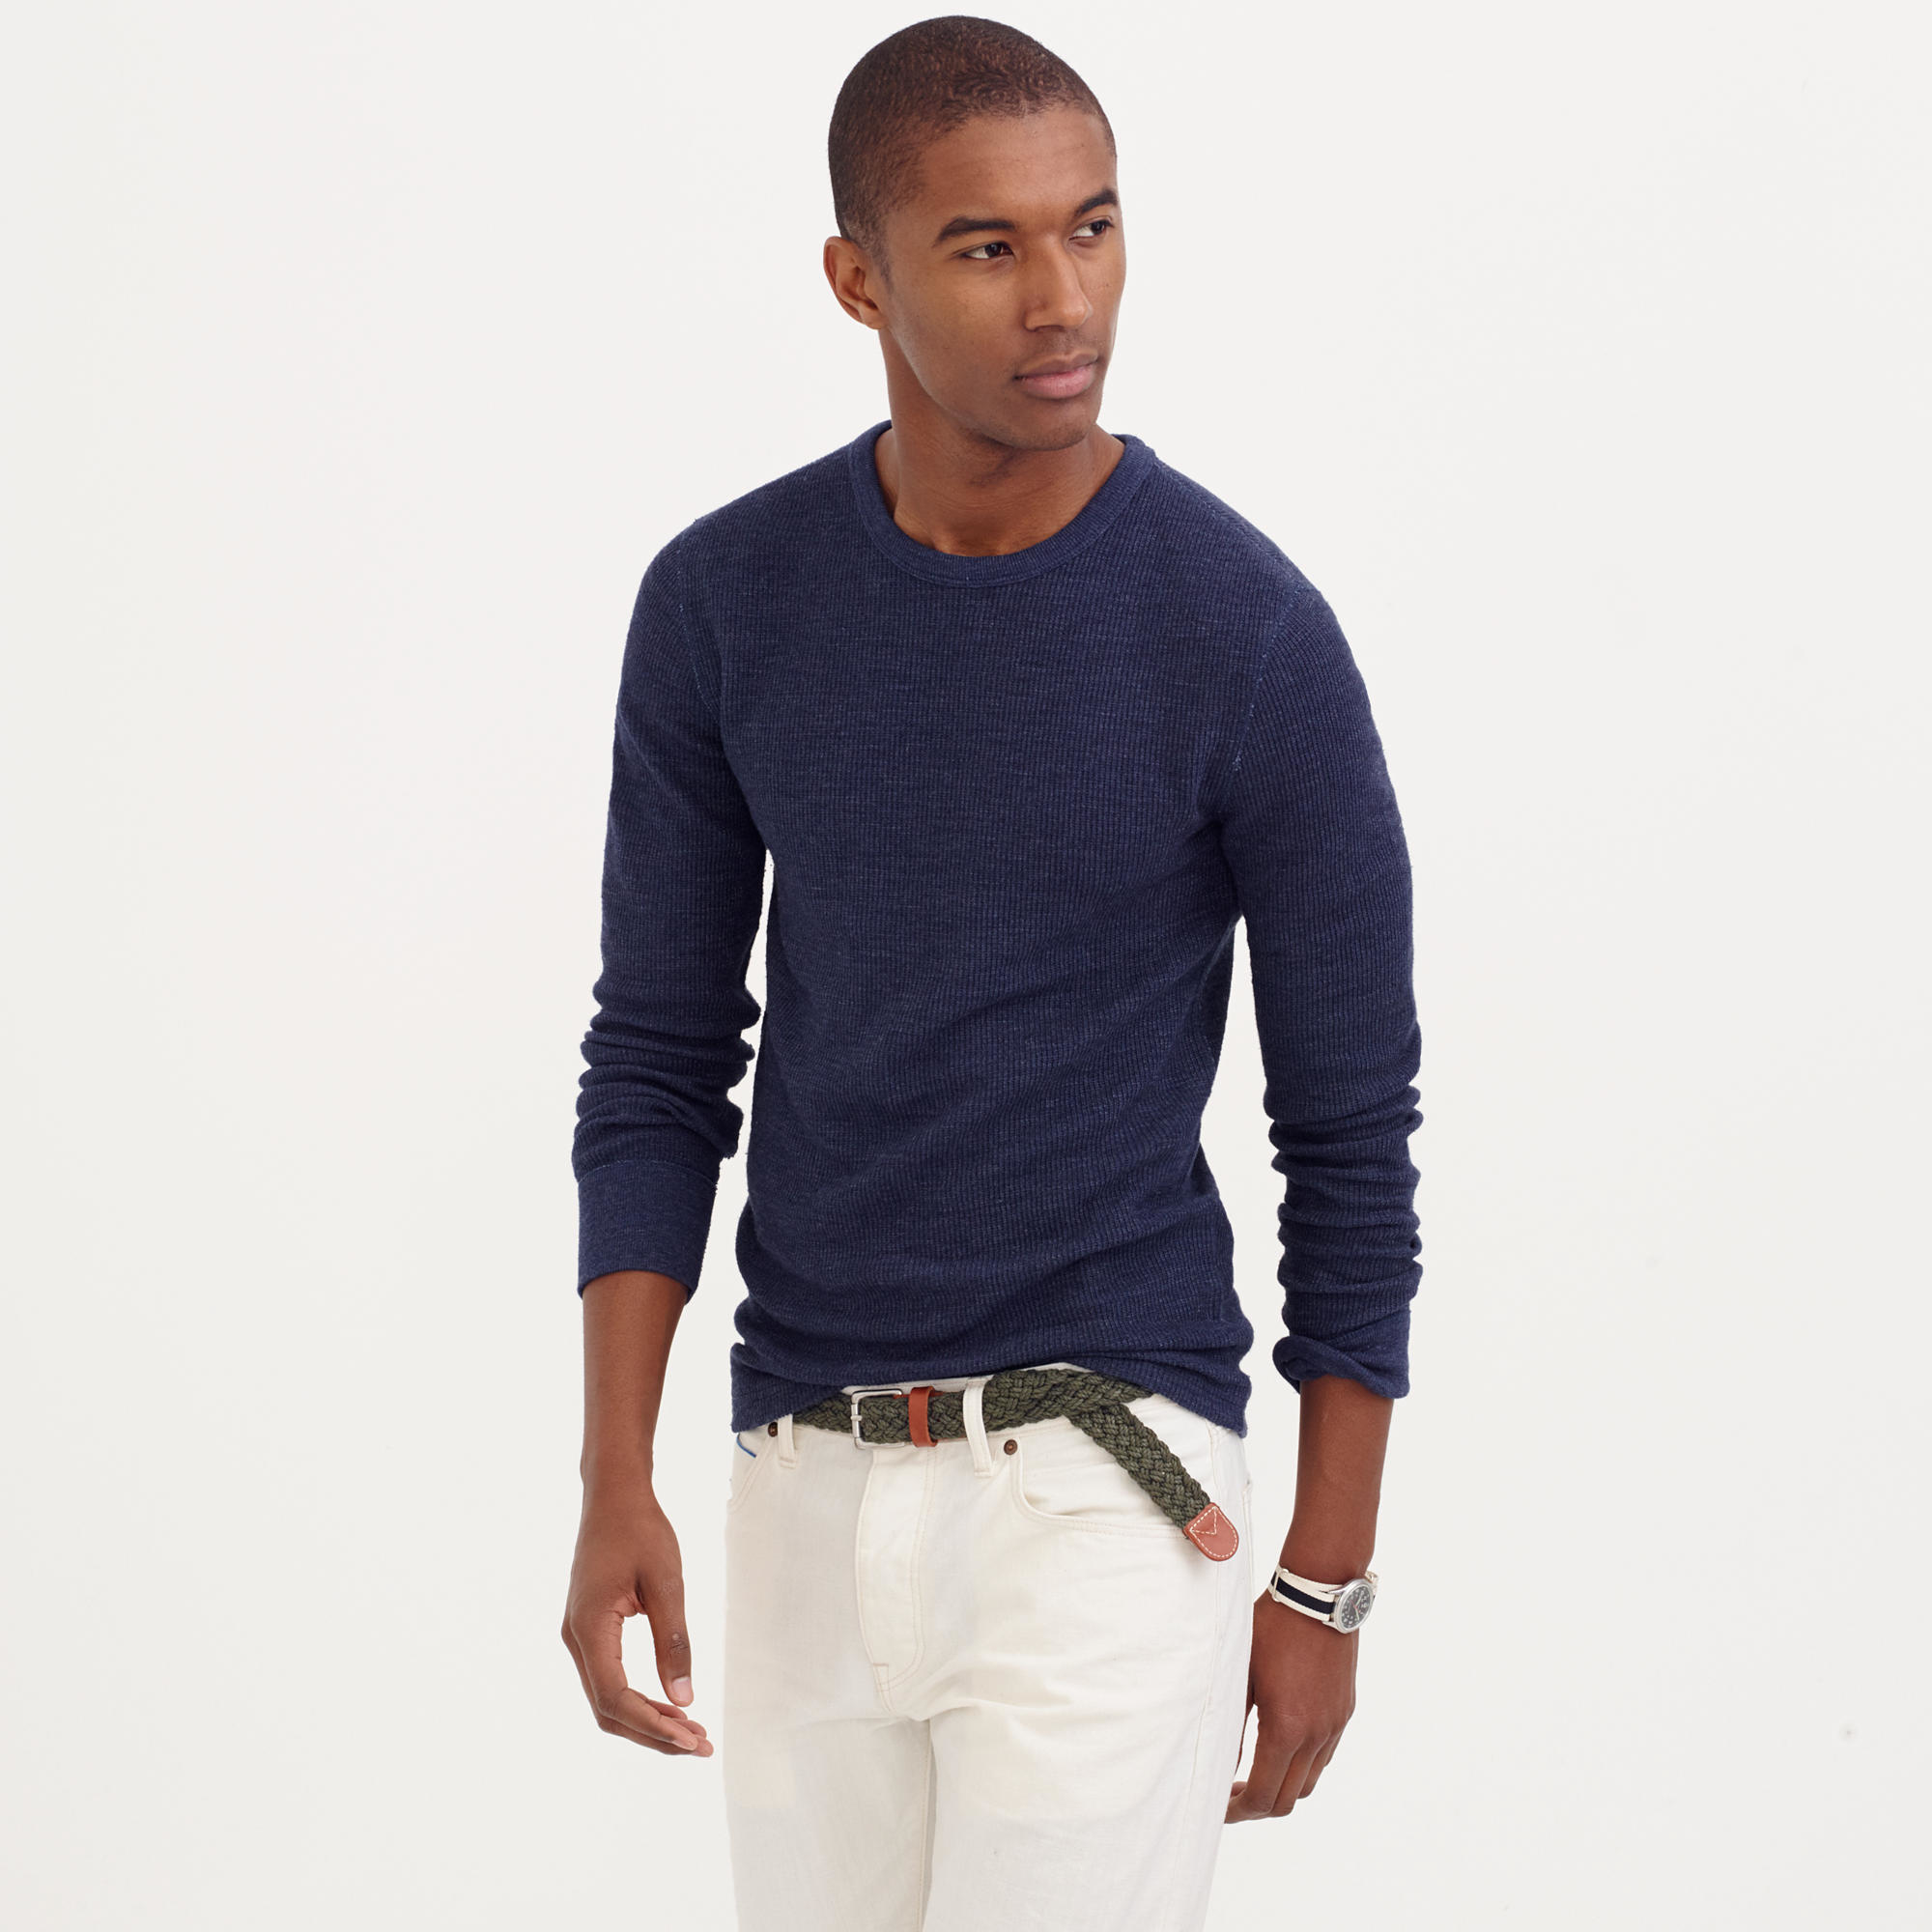 Lyst J Crew Slim Long Sleeve Thermal T Shirt In Blue For Men: thermal t shirt long sleeve